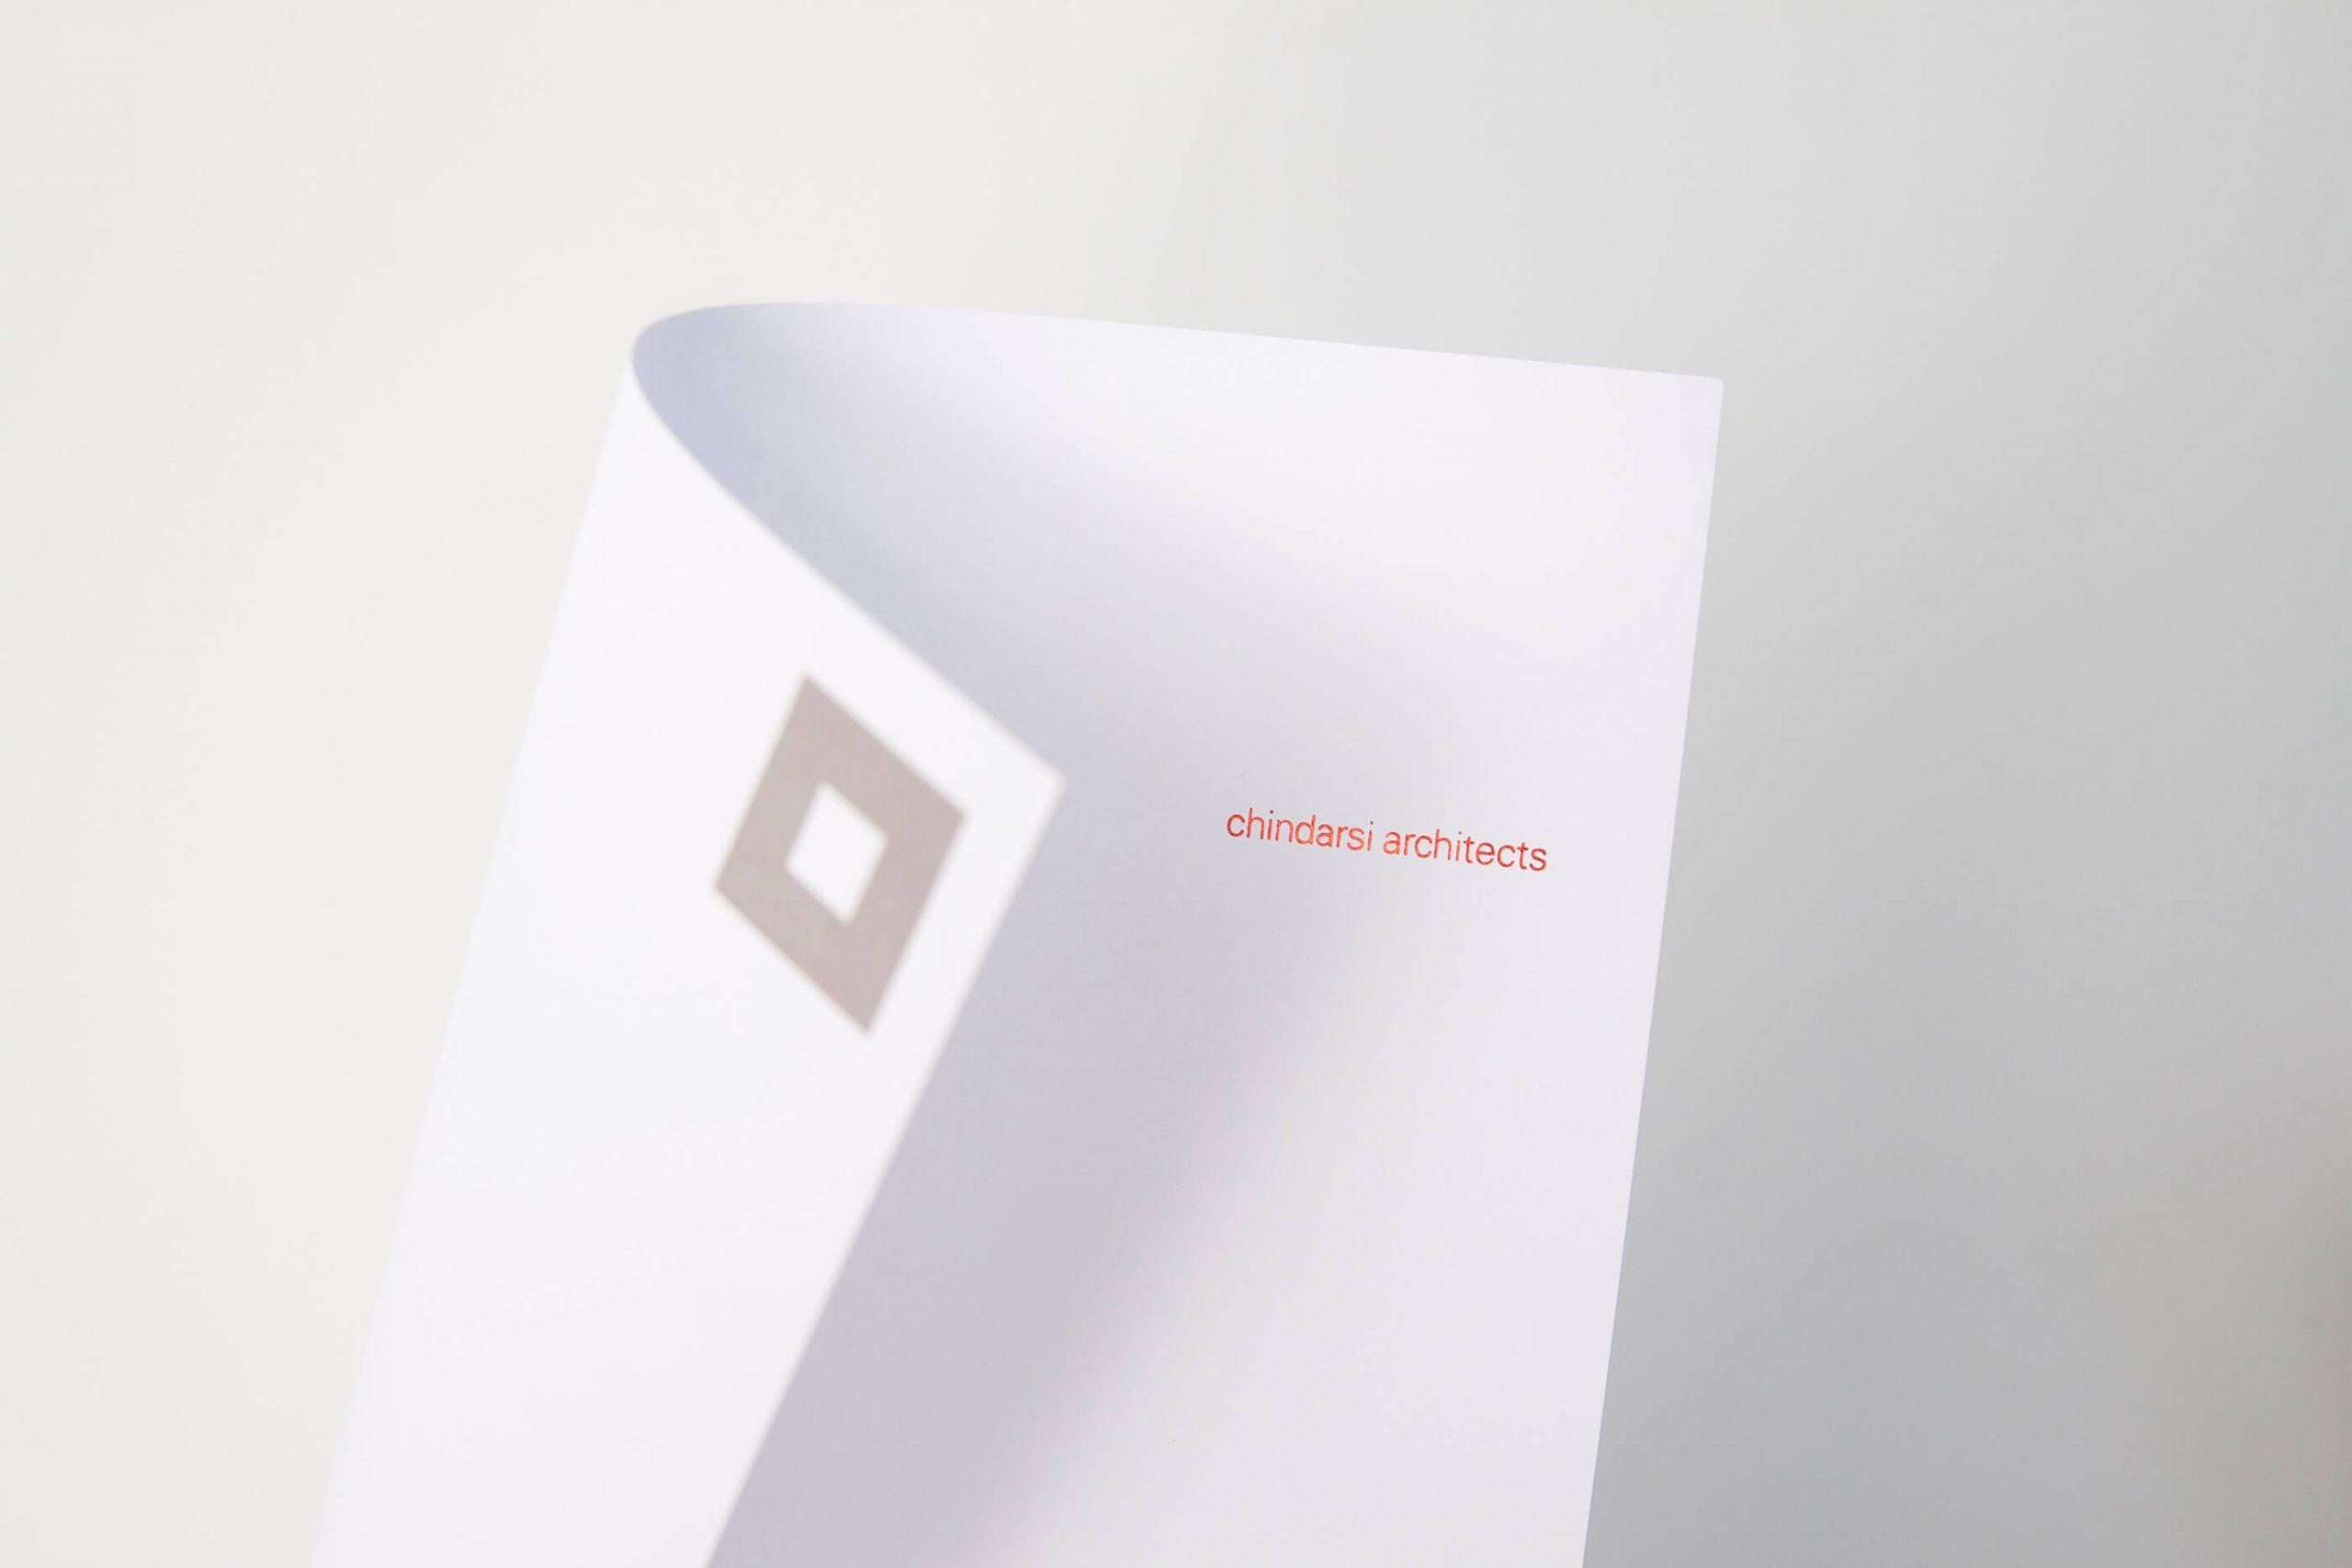 chindarsi-architects-letterhead